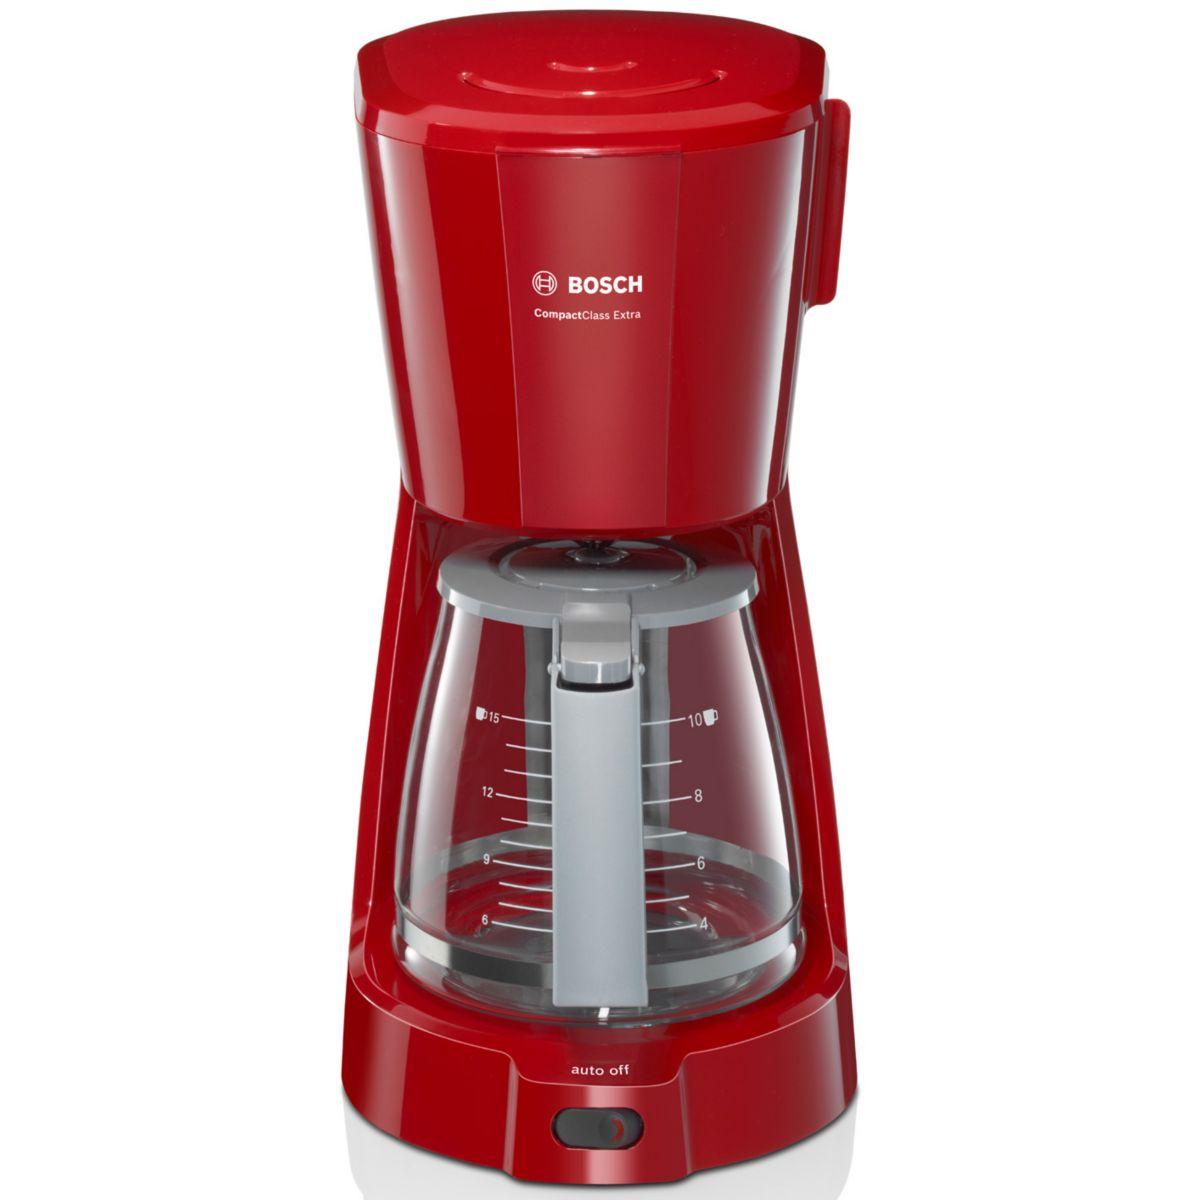 Cafetière filtre bosch tka3a034 rouge (photo)